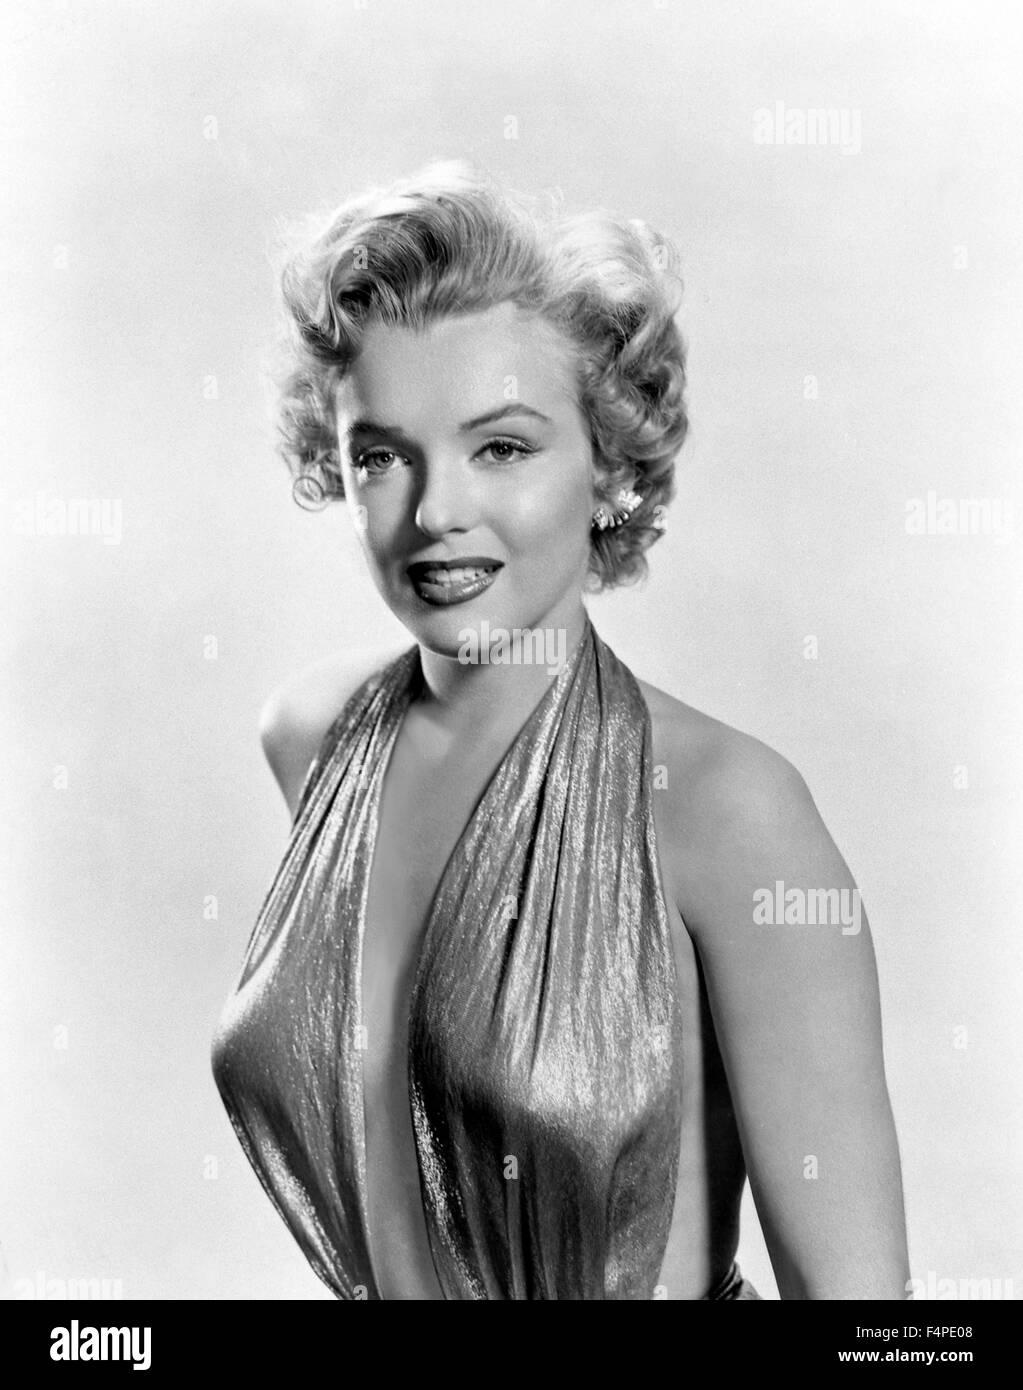 Marilyn Monroe in 1954 - Stock Image